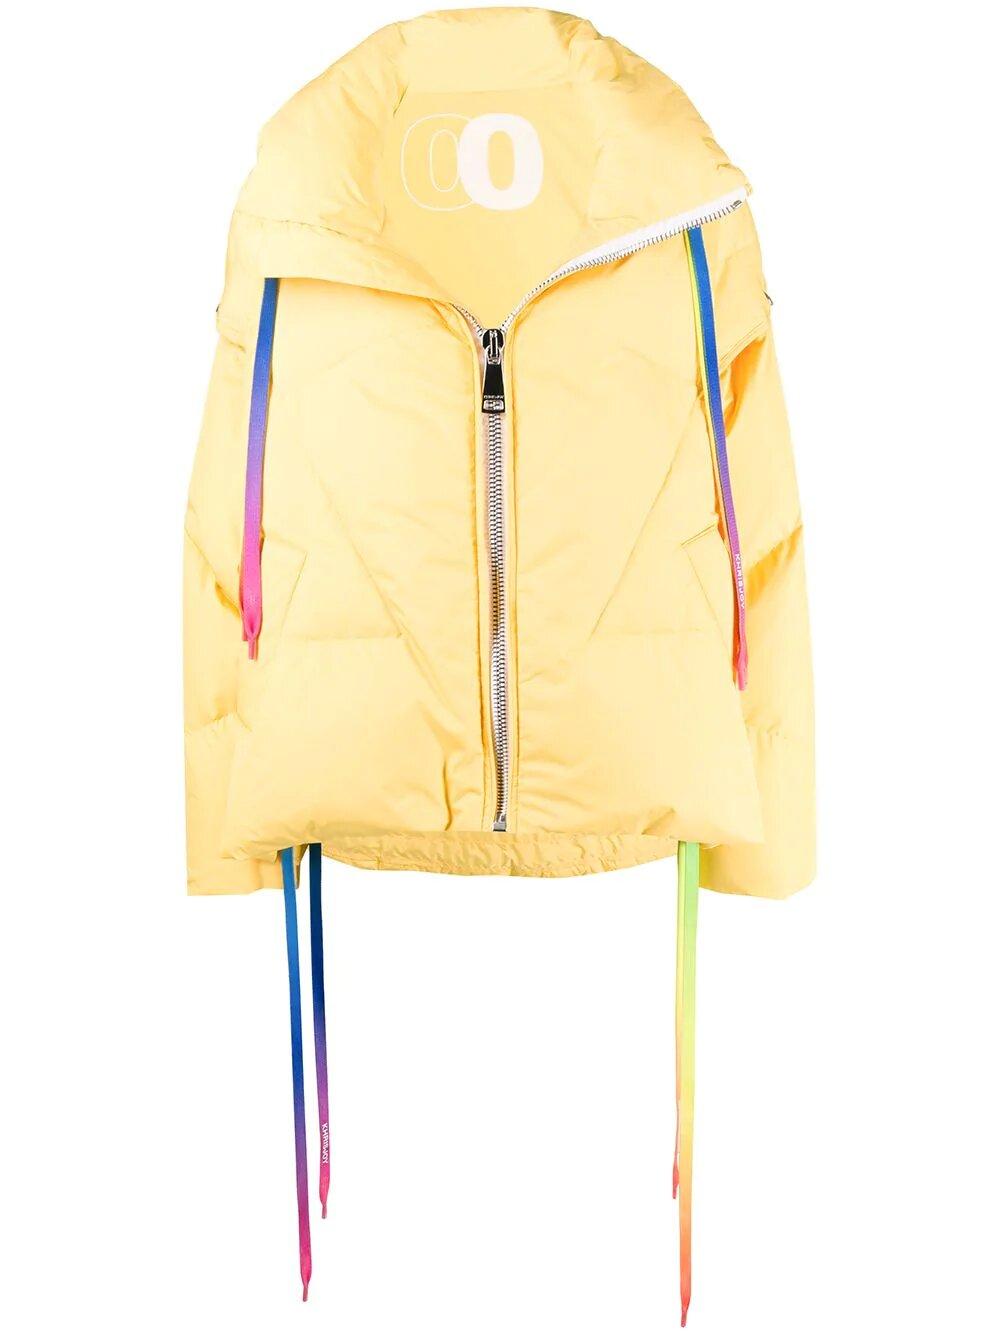 Khrisjoy, Rainbow drawstrings puffer jacket 3001лв,2432лв